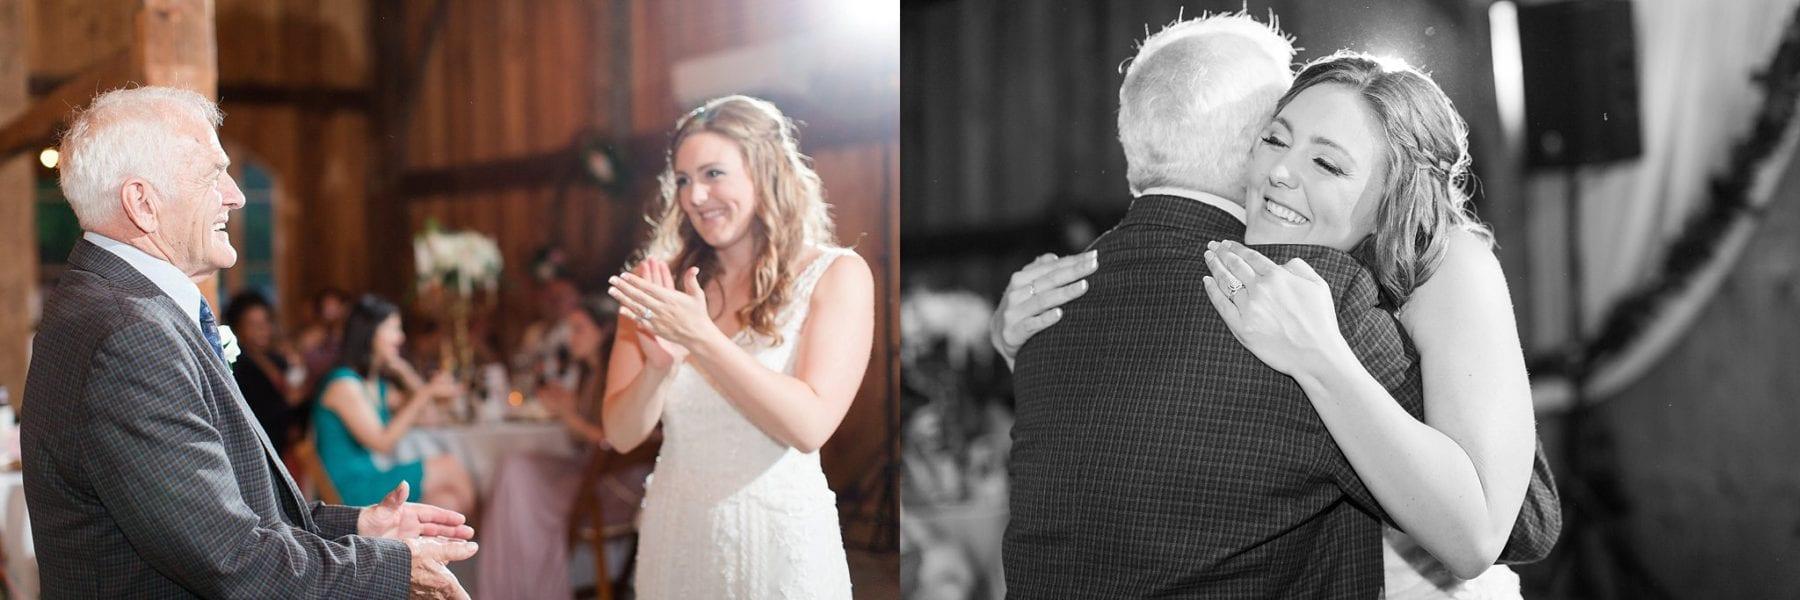 Justin & Megan Big Spring Farm Wedding Photos-528.jpg